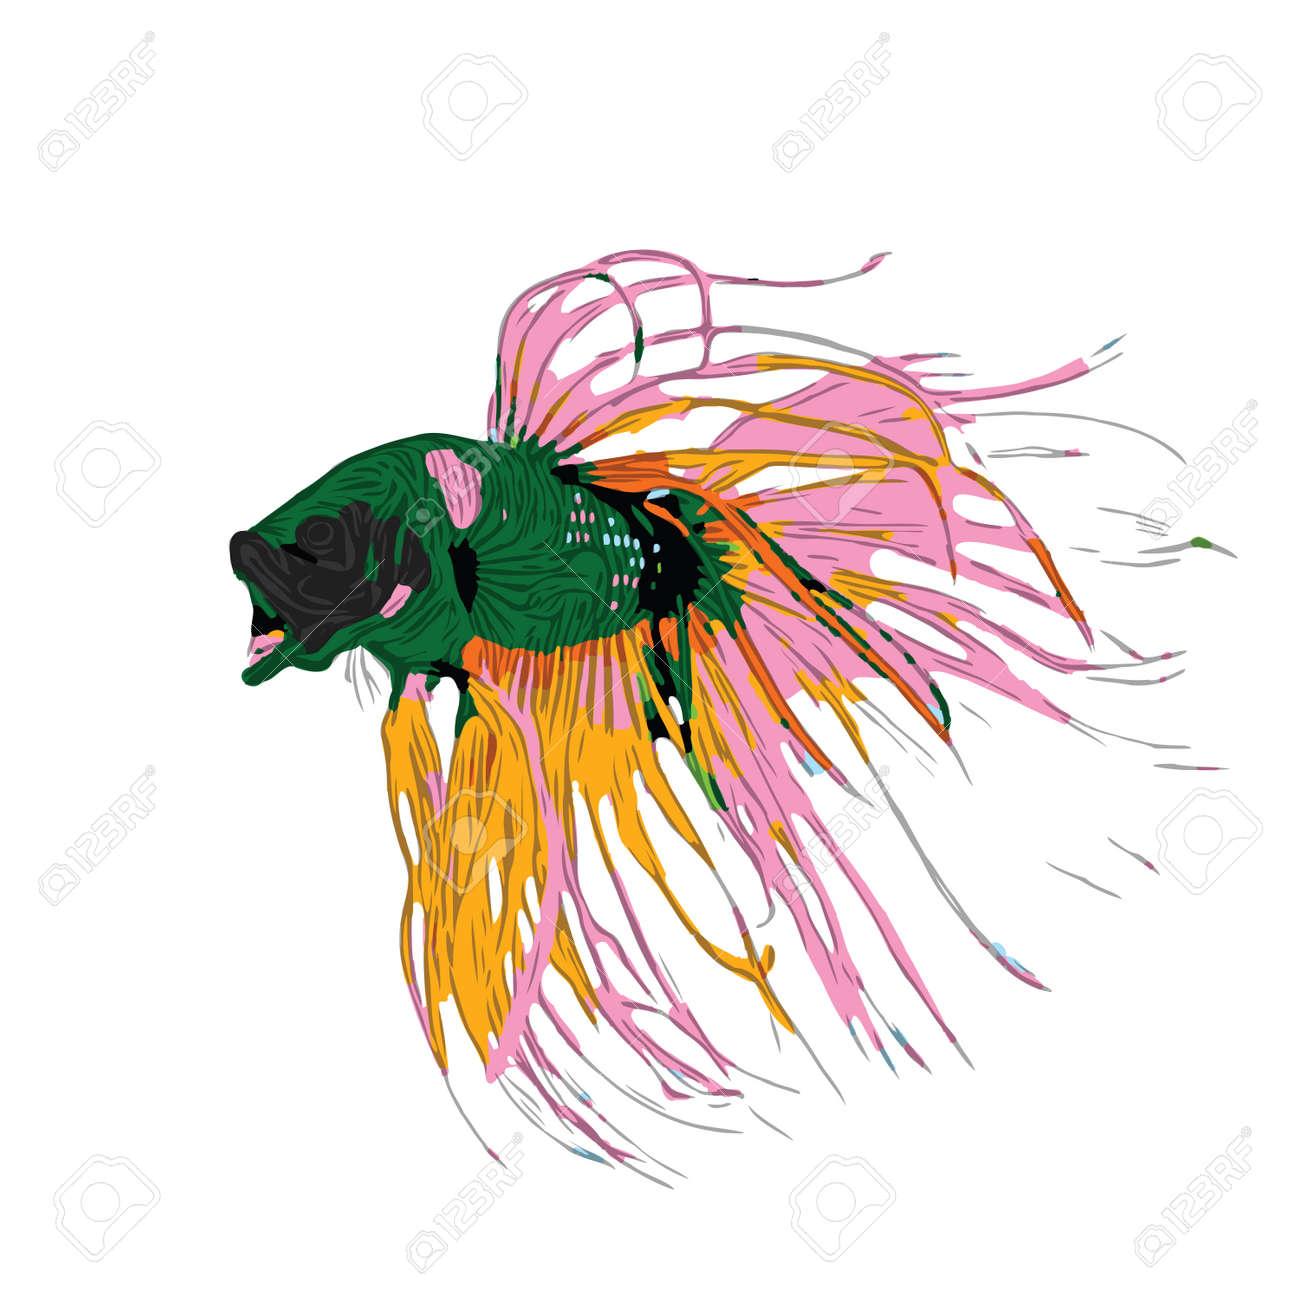 Colorful Betta Fish Vector Illustration. Siamese Fighting Fish. Betta Splendens, isolated on white background - 125682086